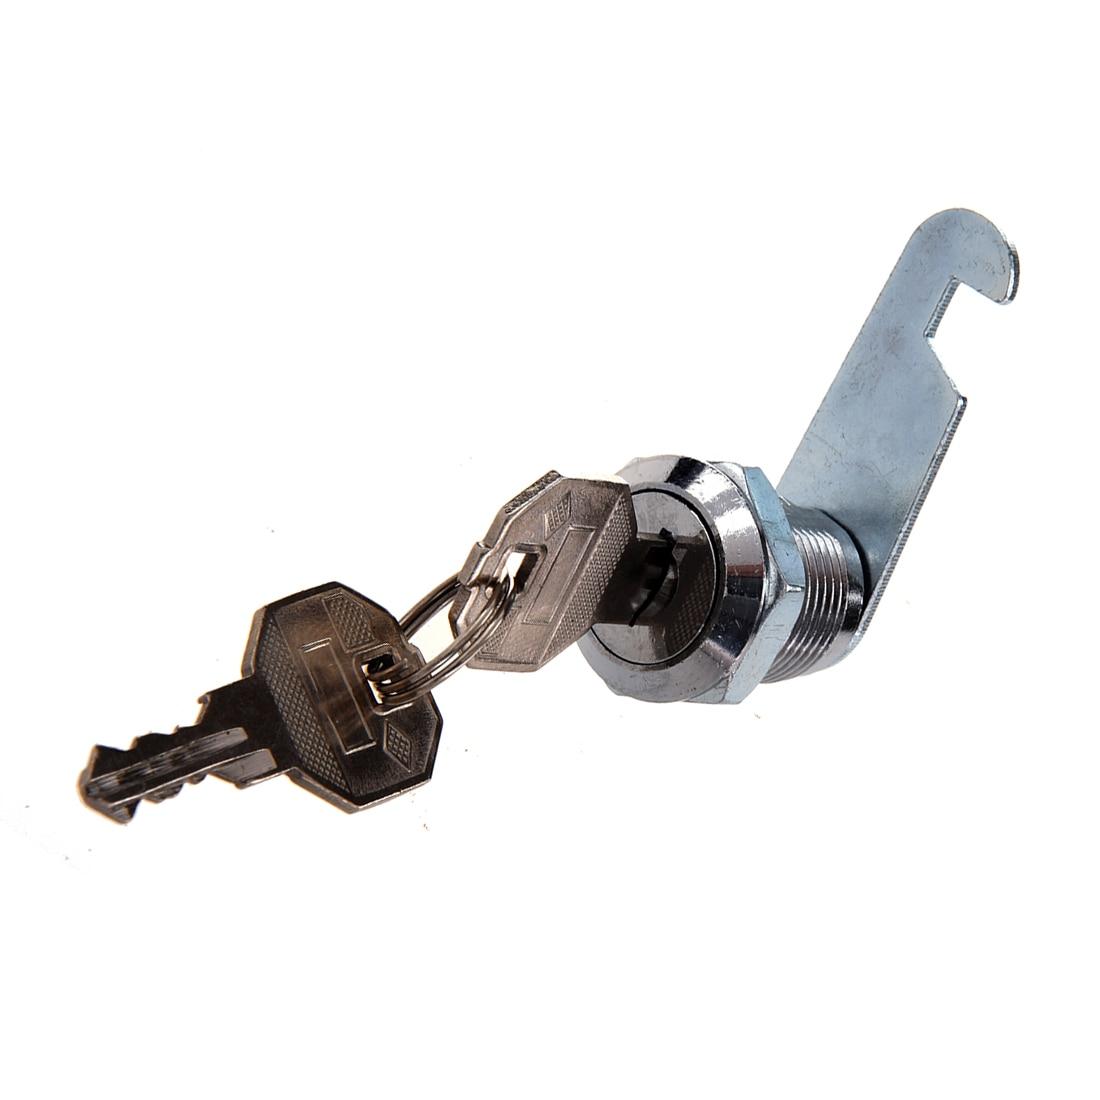 Ton argent métallique 18.5 x Filetage 17 mm armoire tiroir Cam Lock 2 set